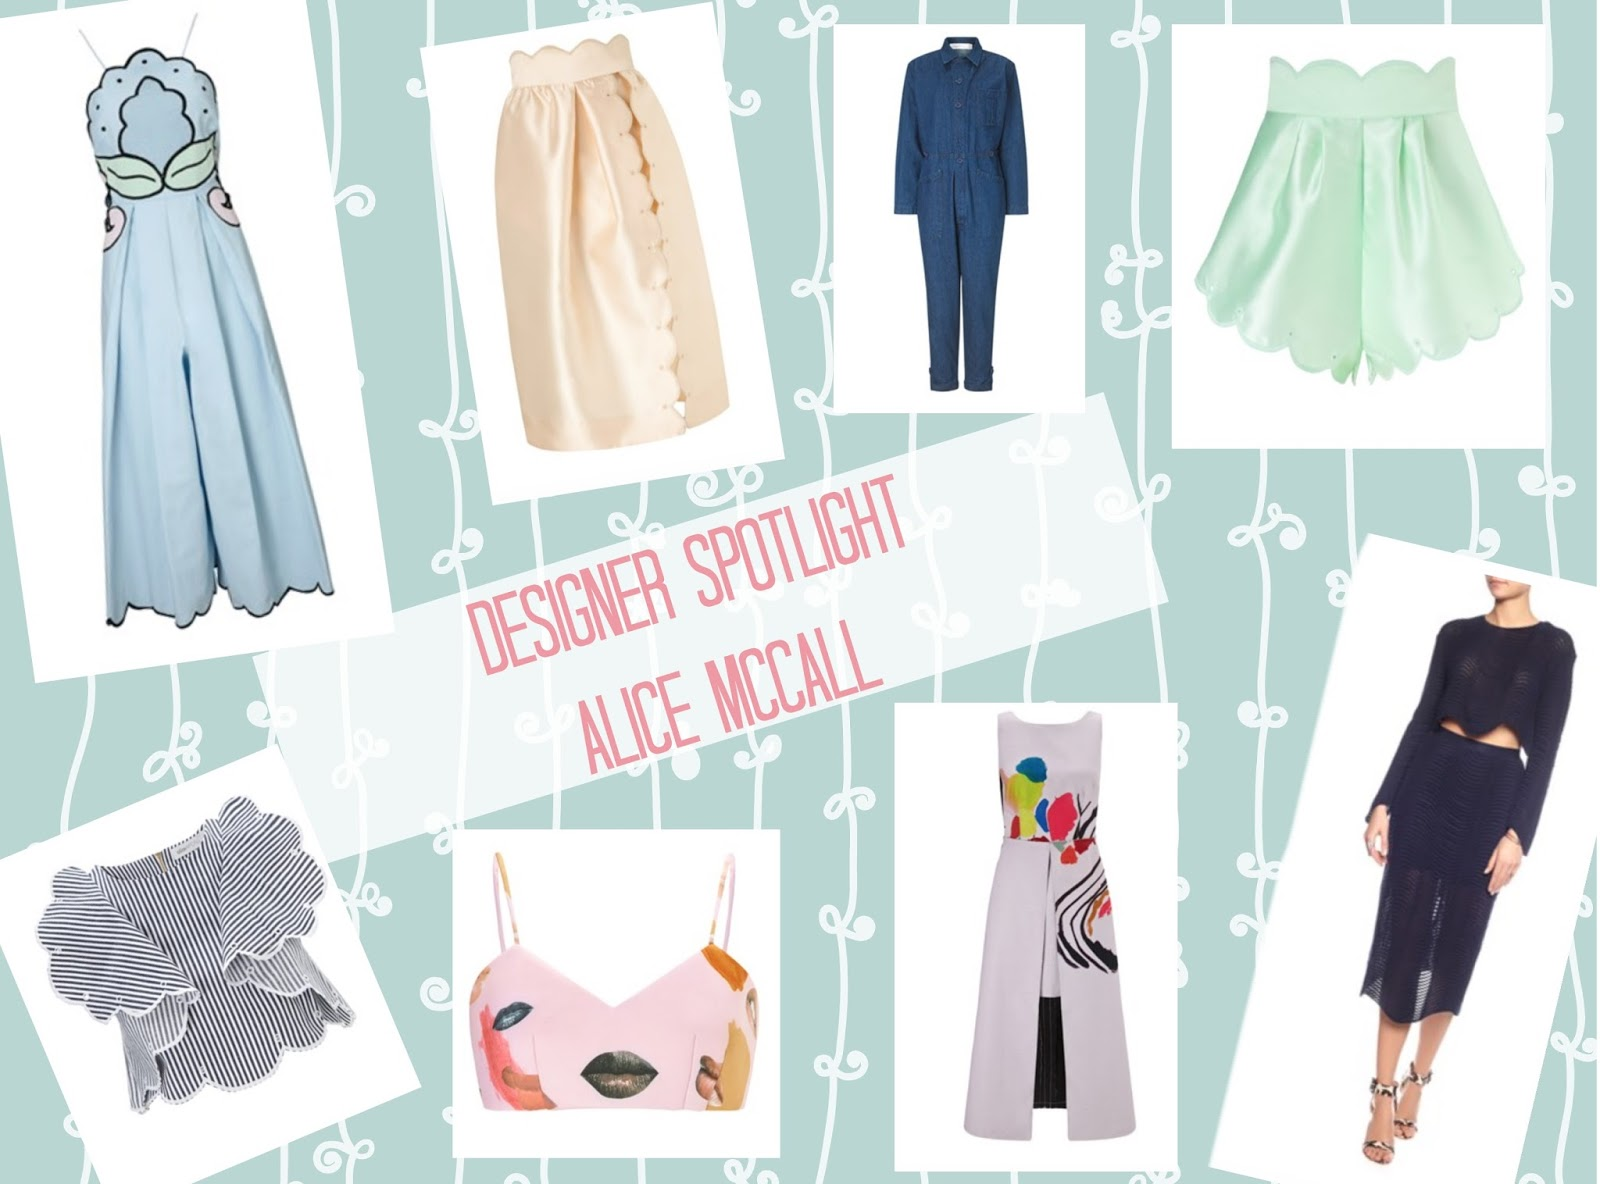 Australian designer Alice McCall